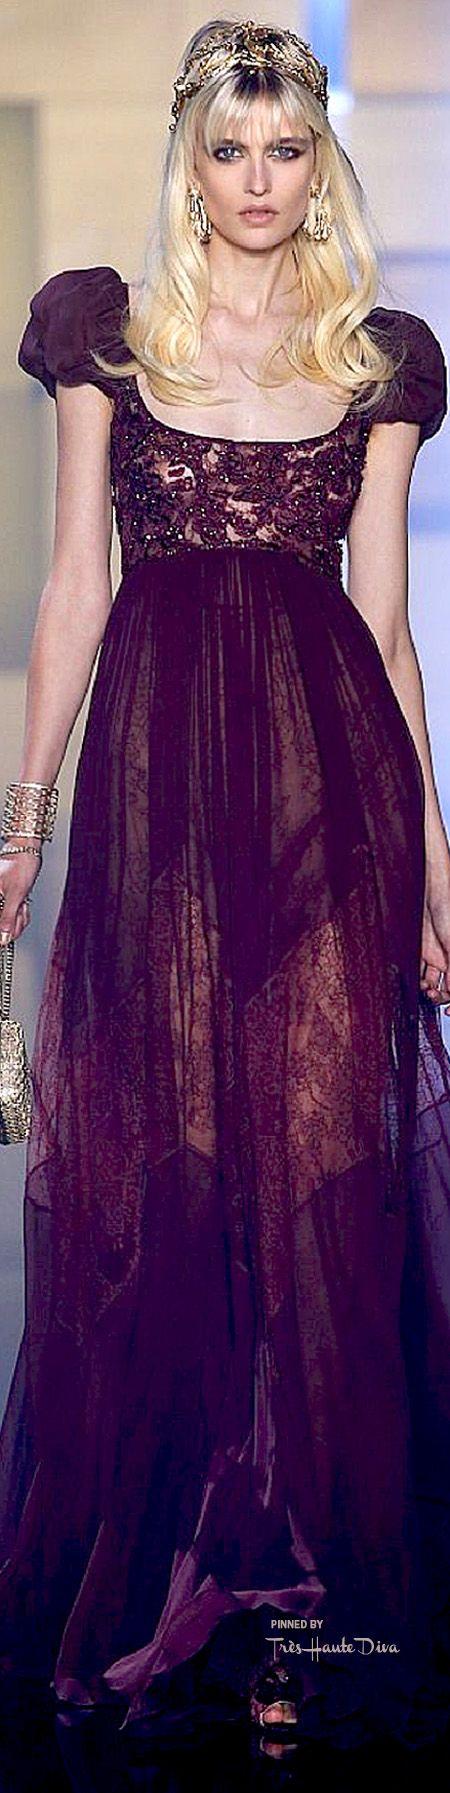 Elie Saab Haute Couture Fall 2015 ♔ Très Haute Diva   jαɢlαdy